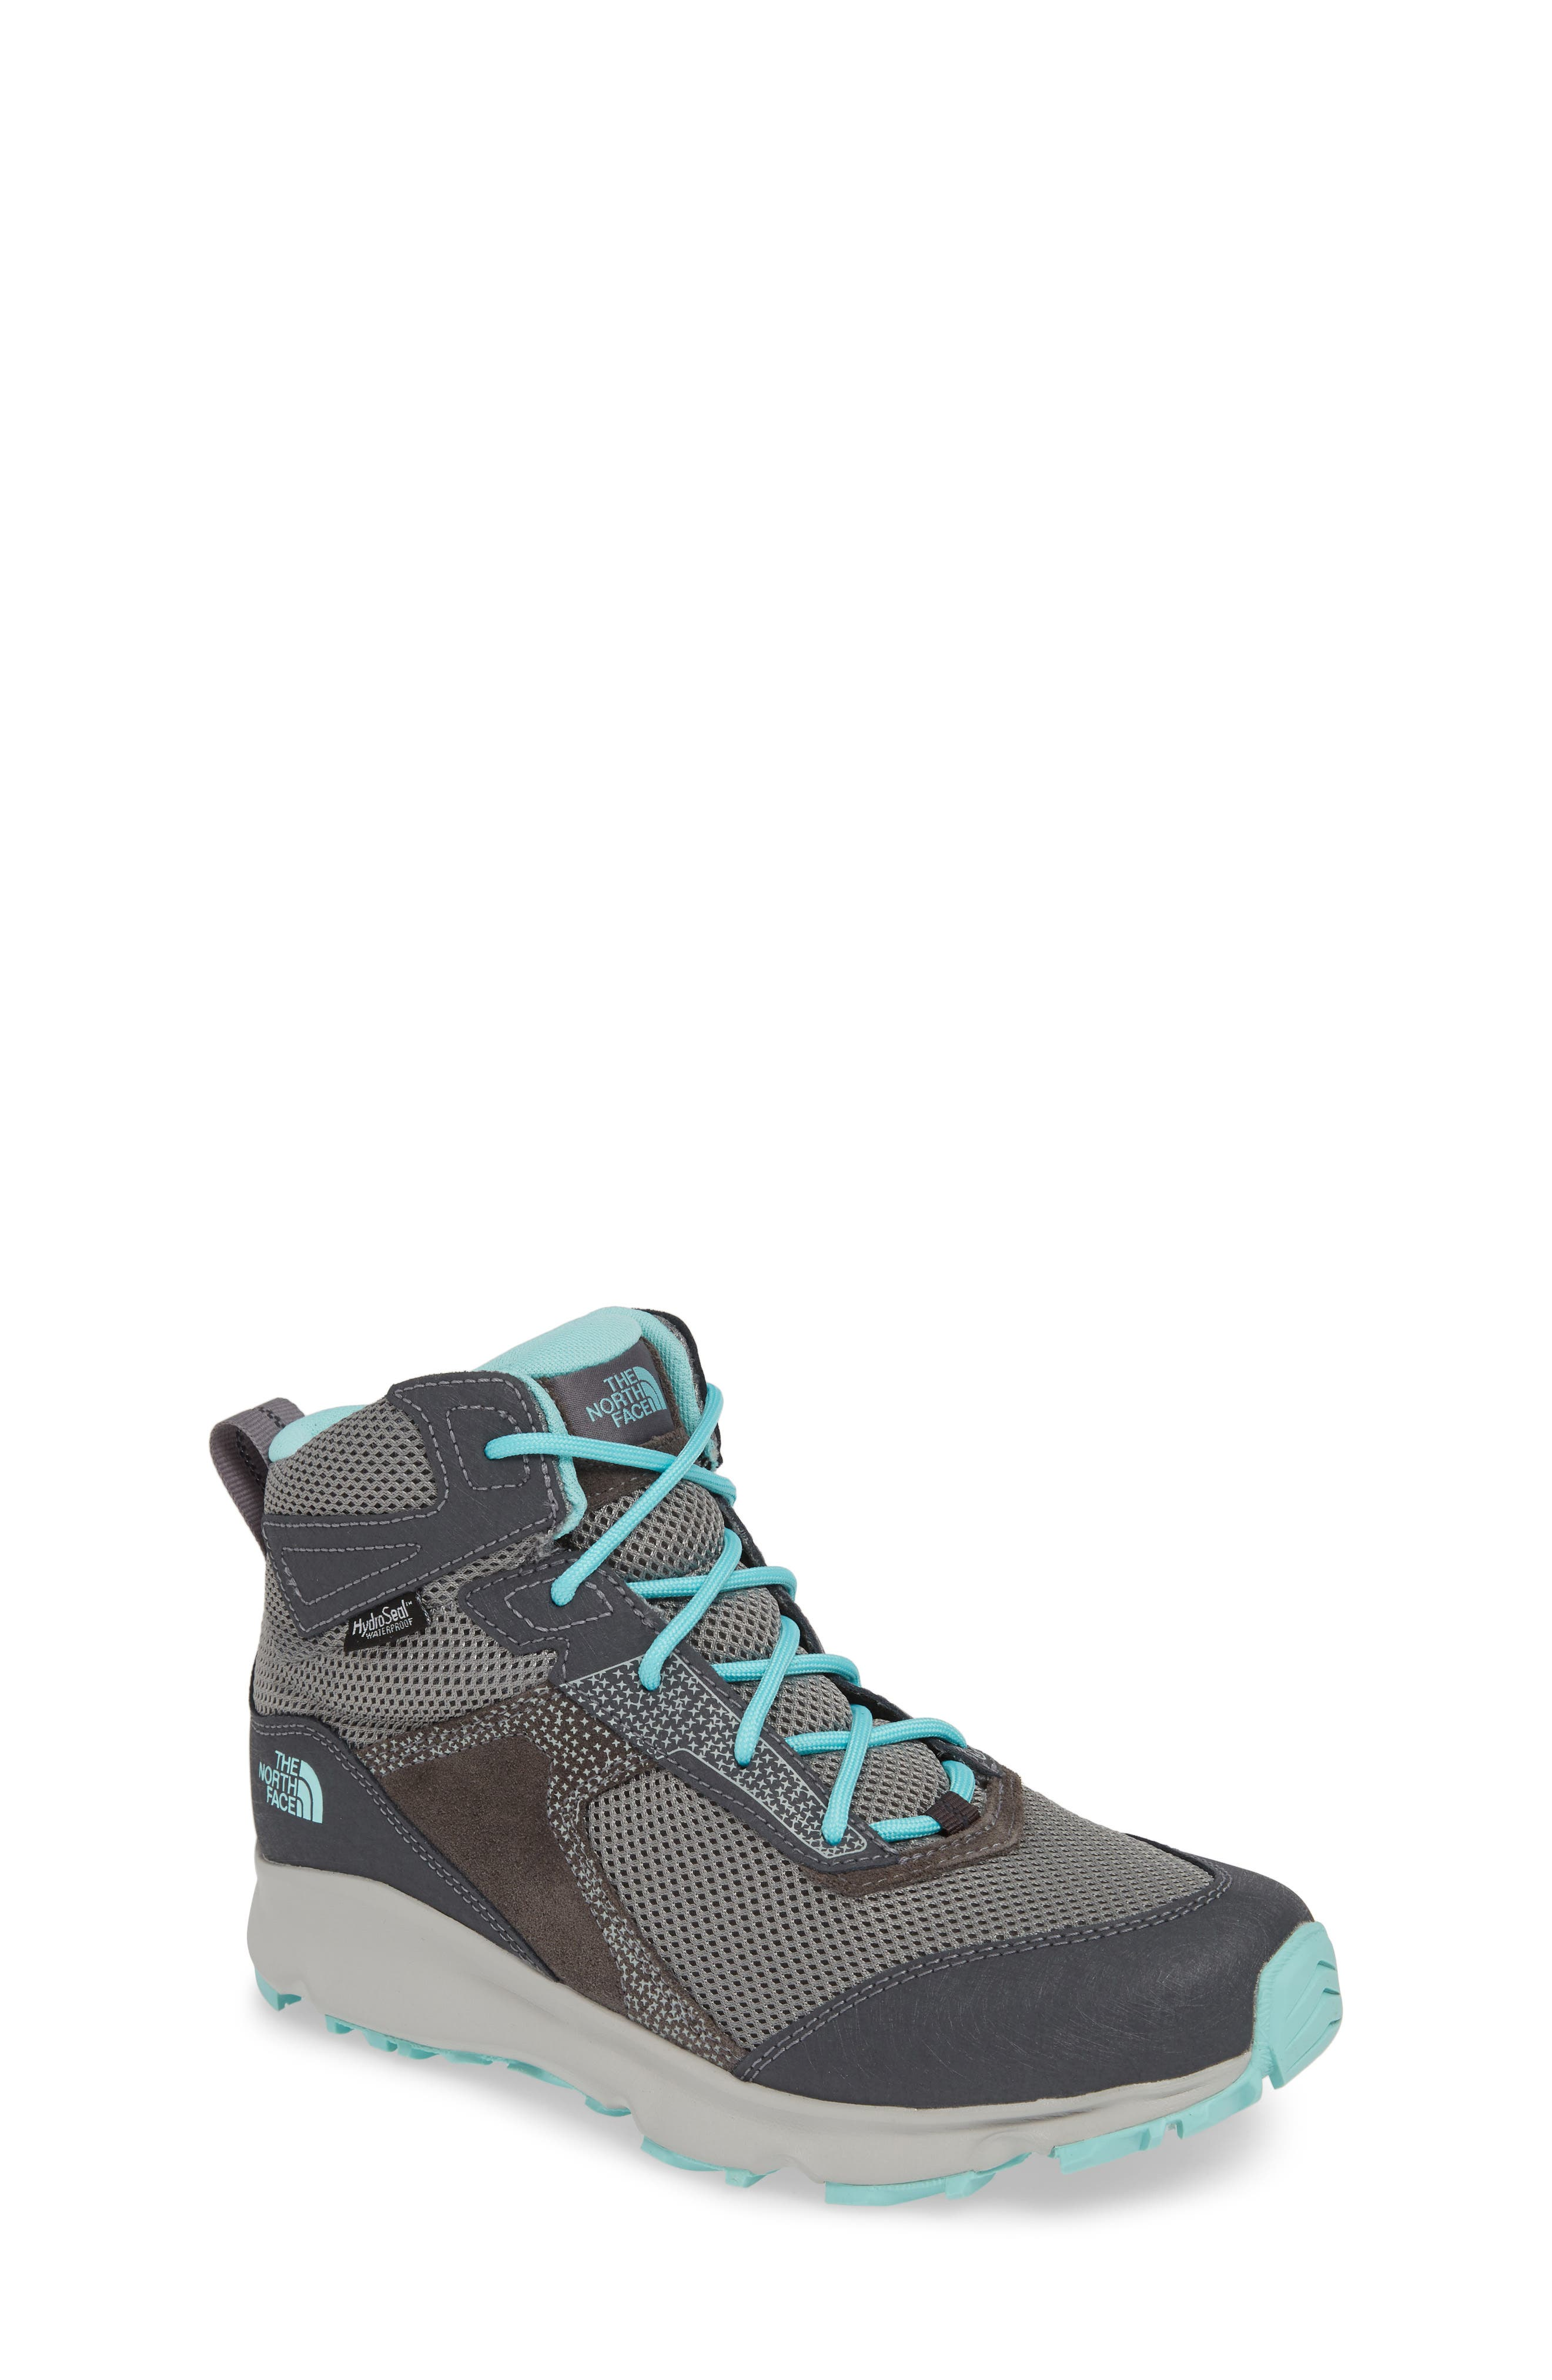 The North Face Hedgehog Ii Waterproof Hiking Boot